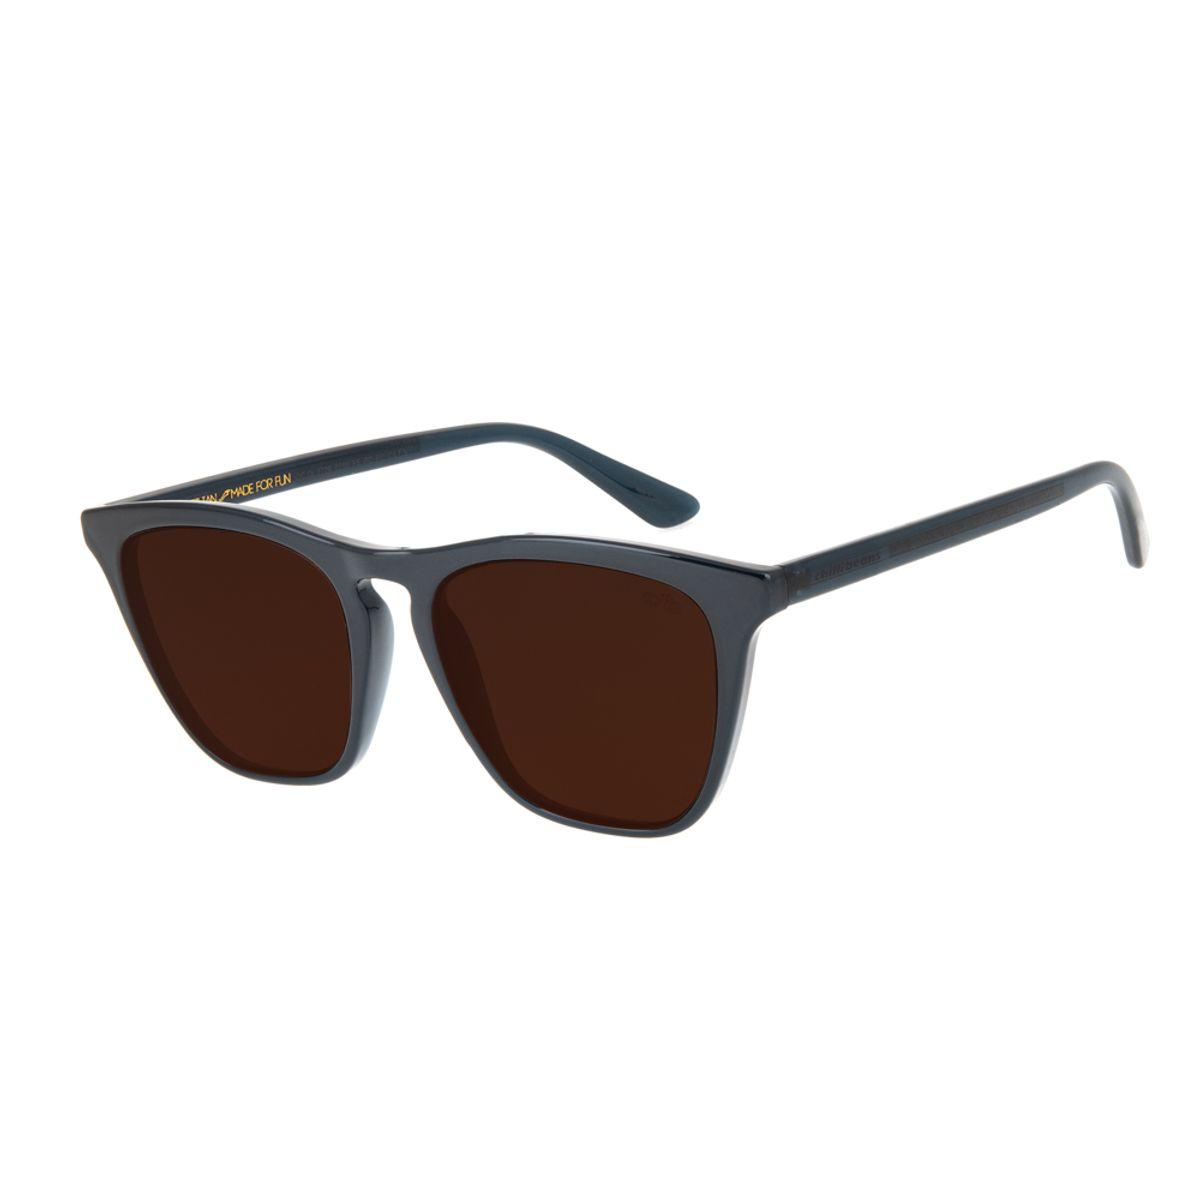 196a9893e Óculos de Sol Chilli Beans Feminino Arte de Rua Crânio 2729 - Chilli ...